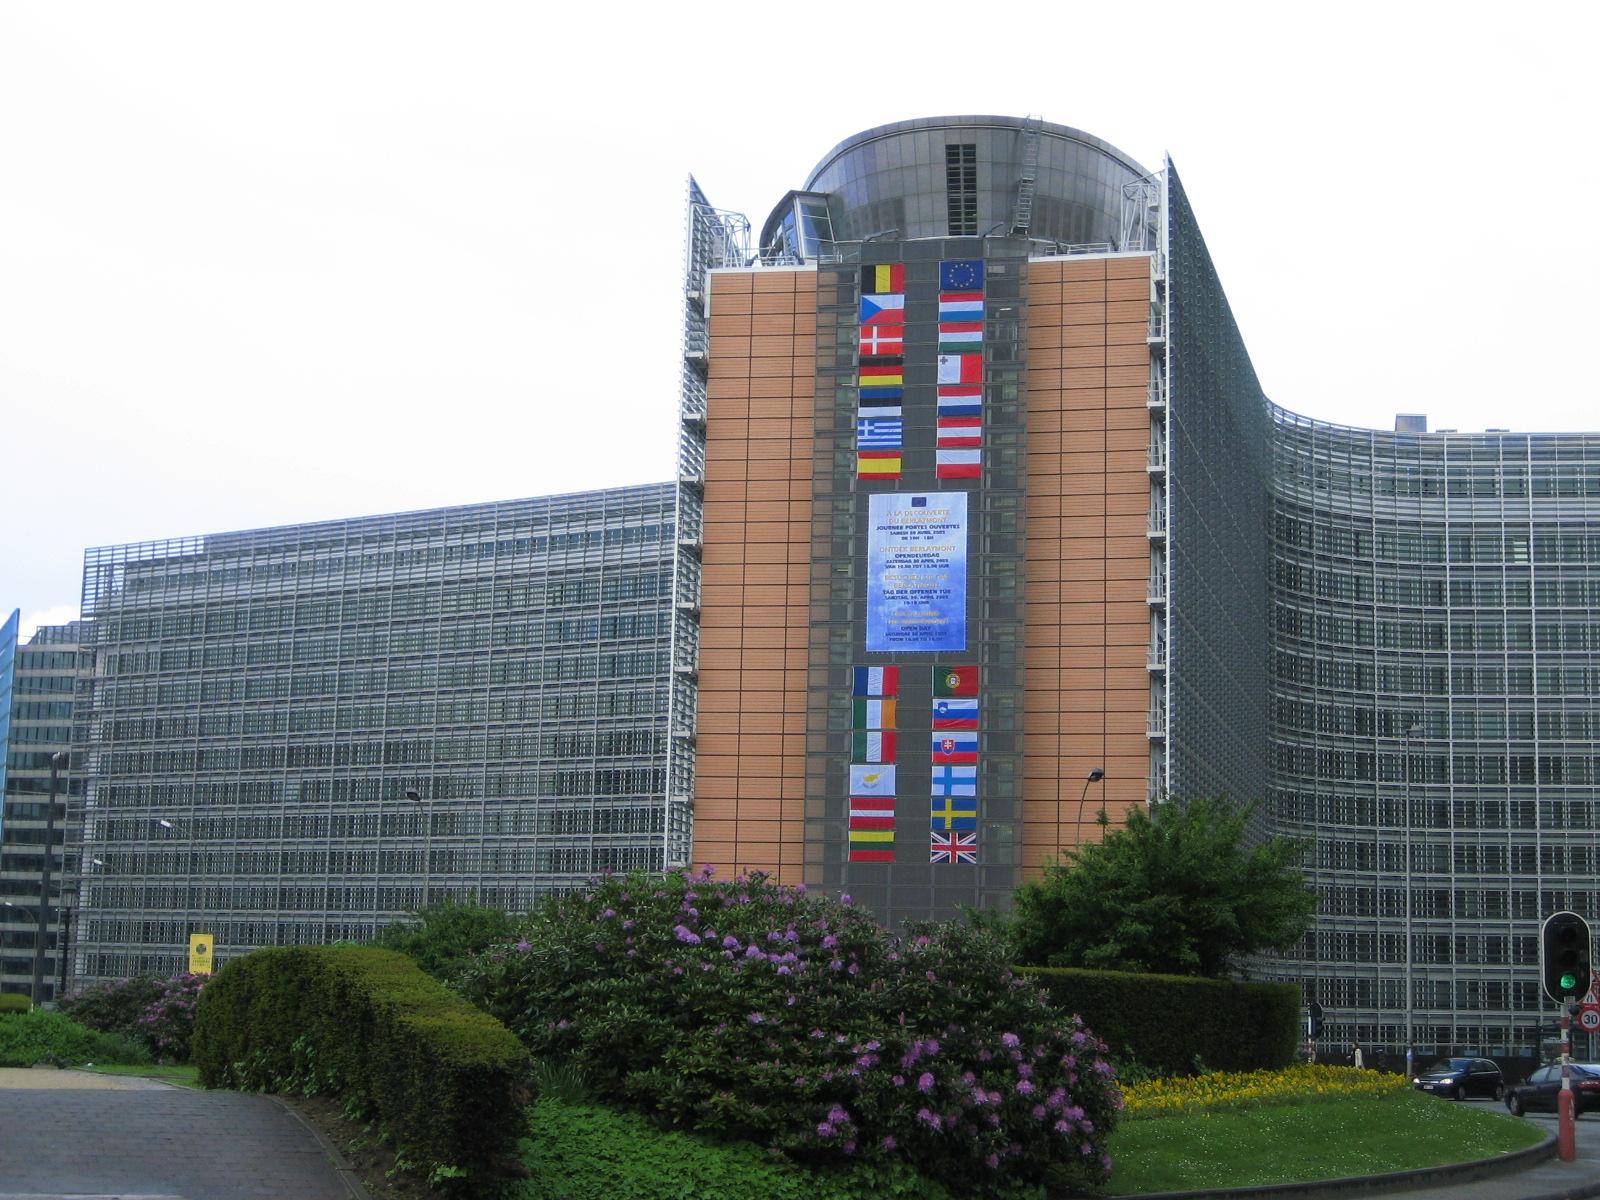 Commissione europea - photo credit: Zinneke